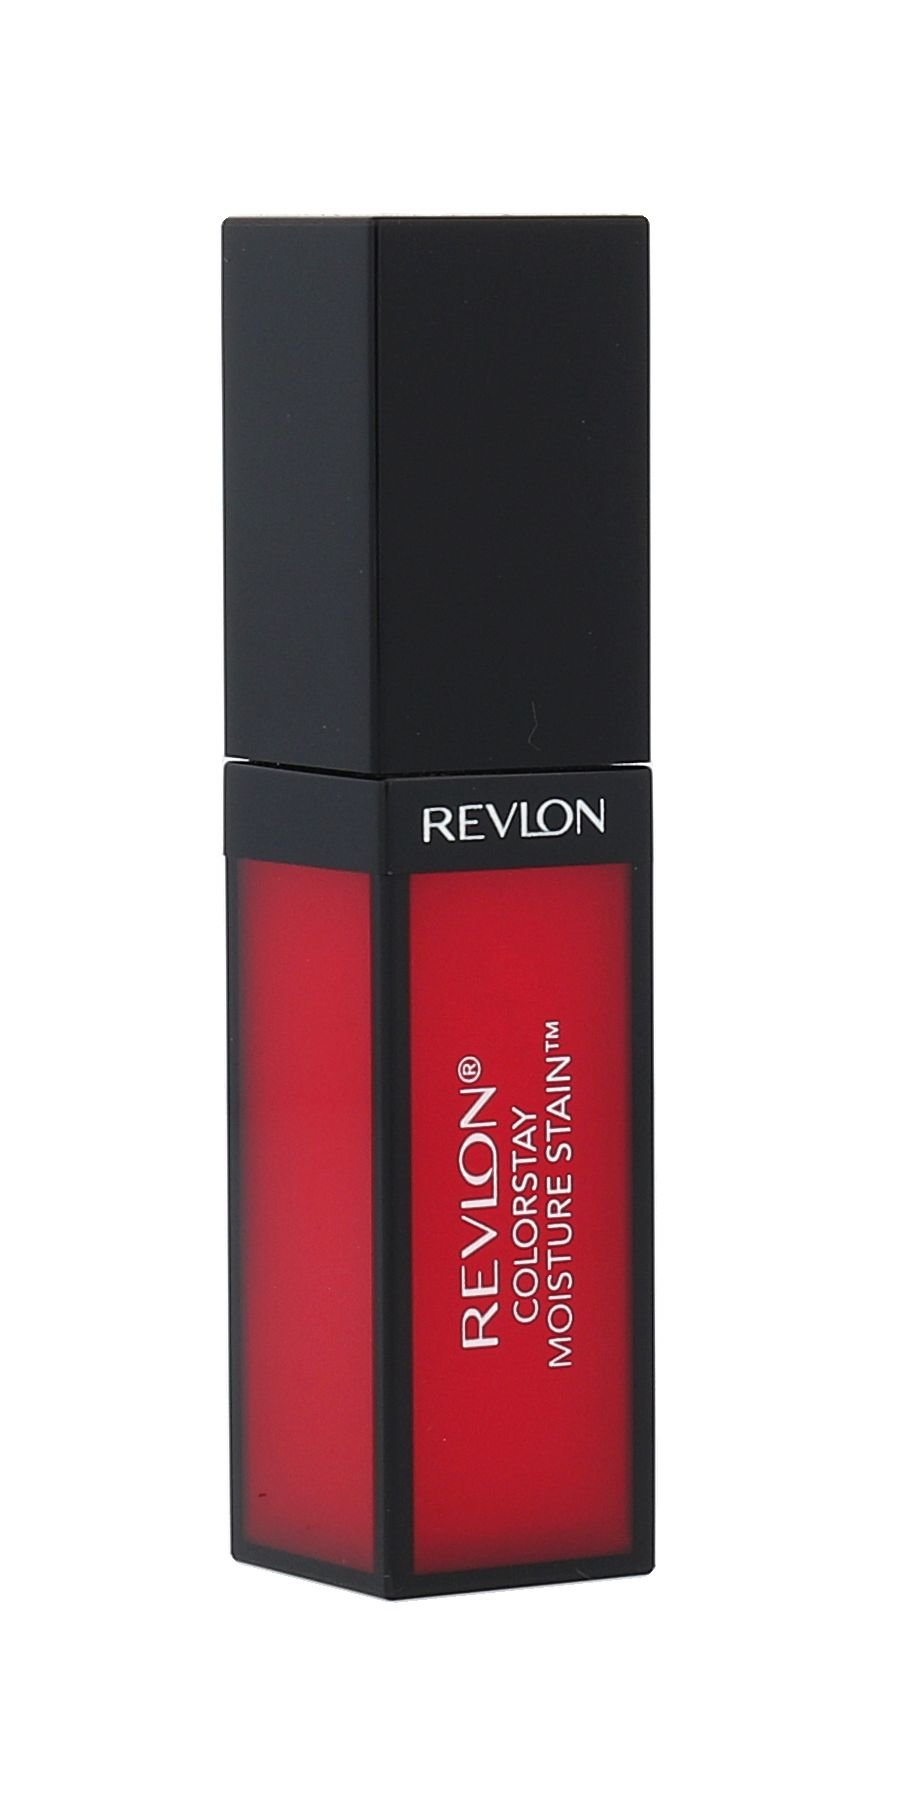 Revlon Colorstay Cosmetic 8ml 015 Barcelona Nights